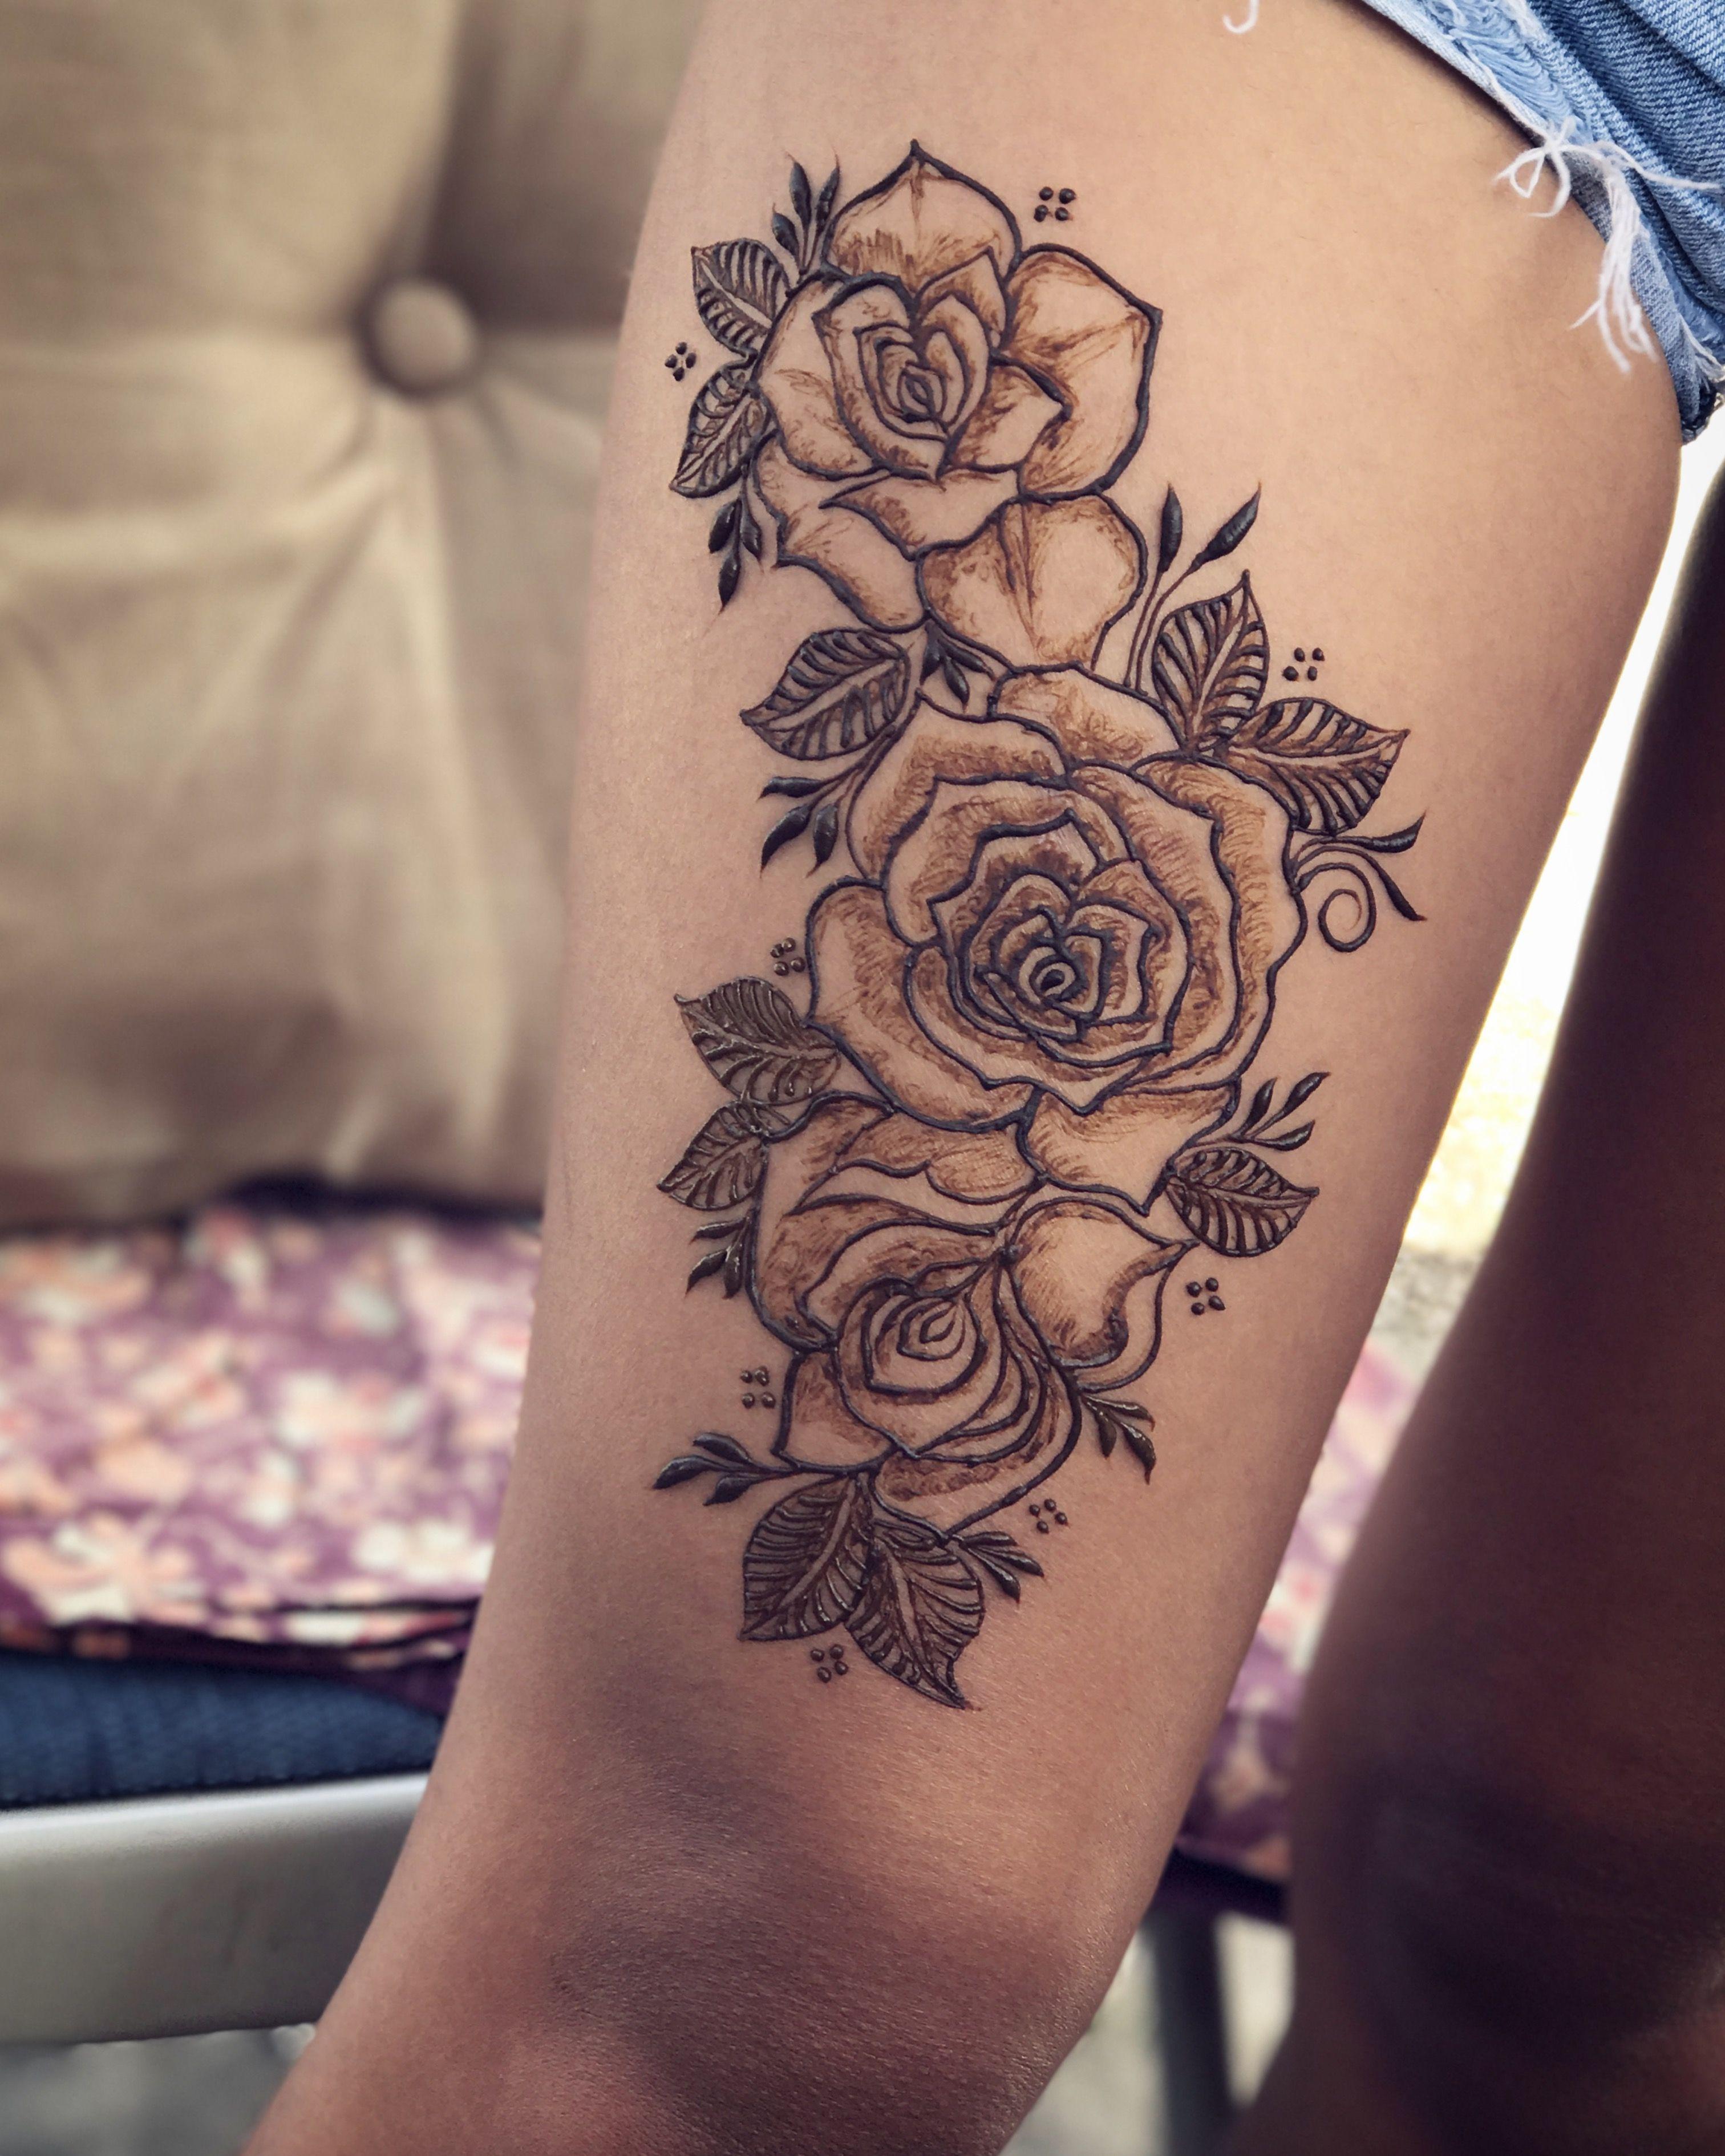 Rose Henna Tattoo Floral Henna Design Rose Henna Flower Henna Floral Henna Designs